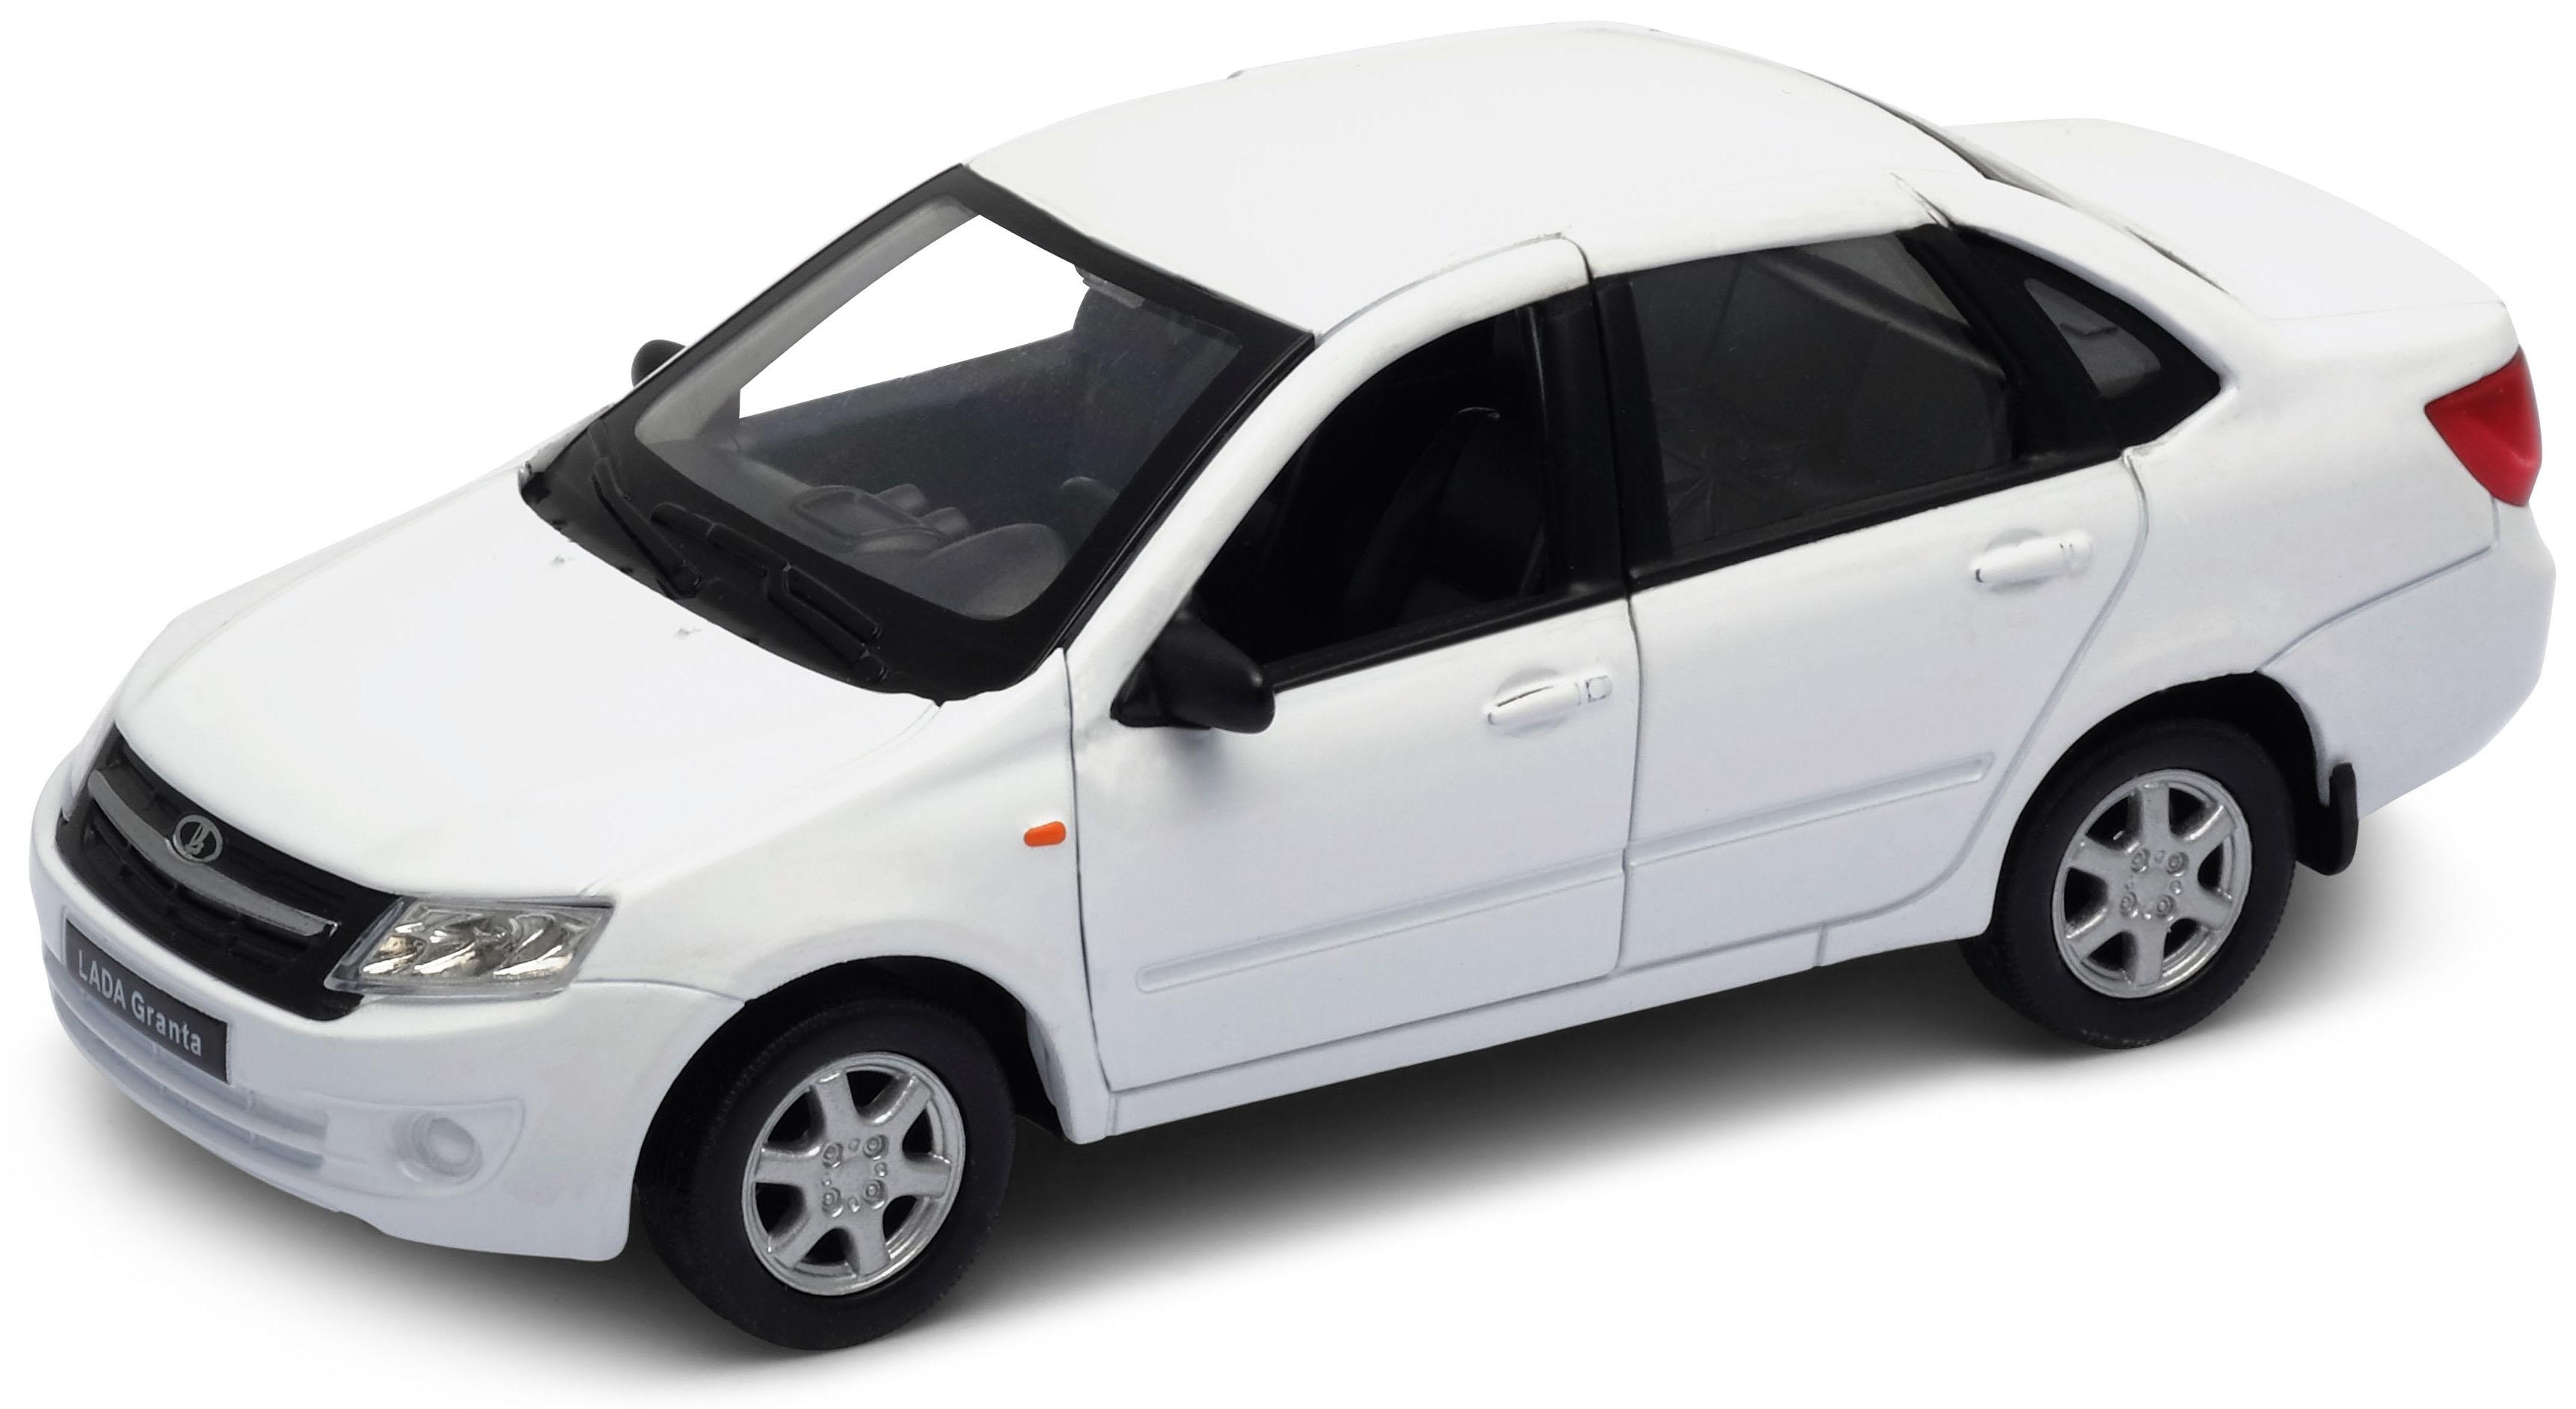 Машинки и мотоциклы Welly Модель машины Welly «Lada Granta» 1:34-39 welly модель машины 1 34 39 lada granta такси